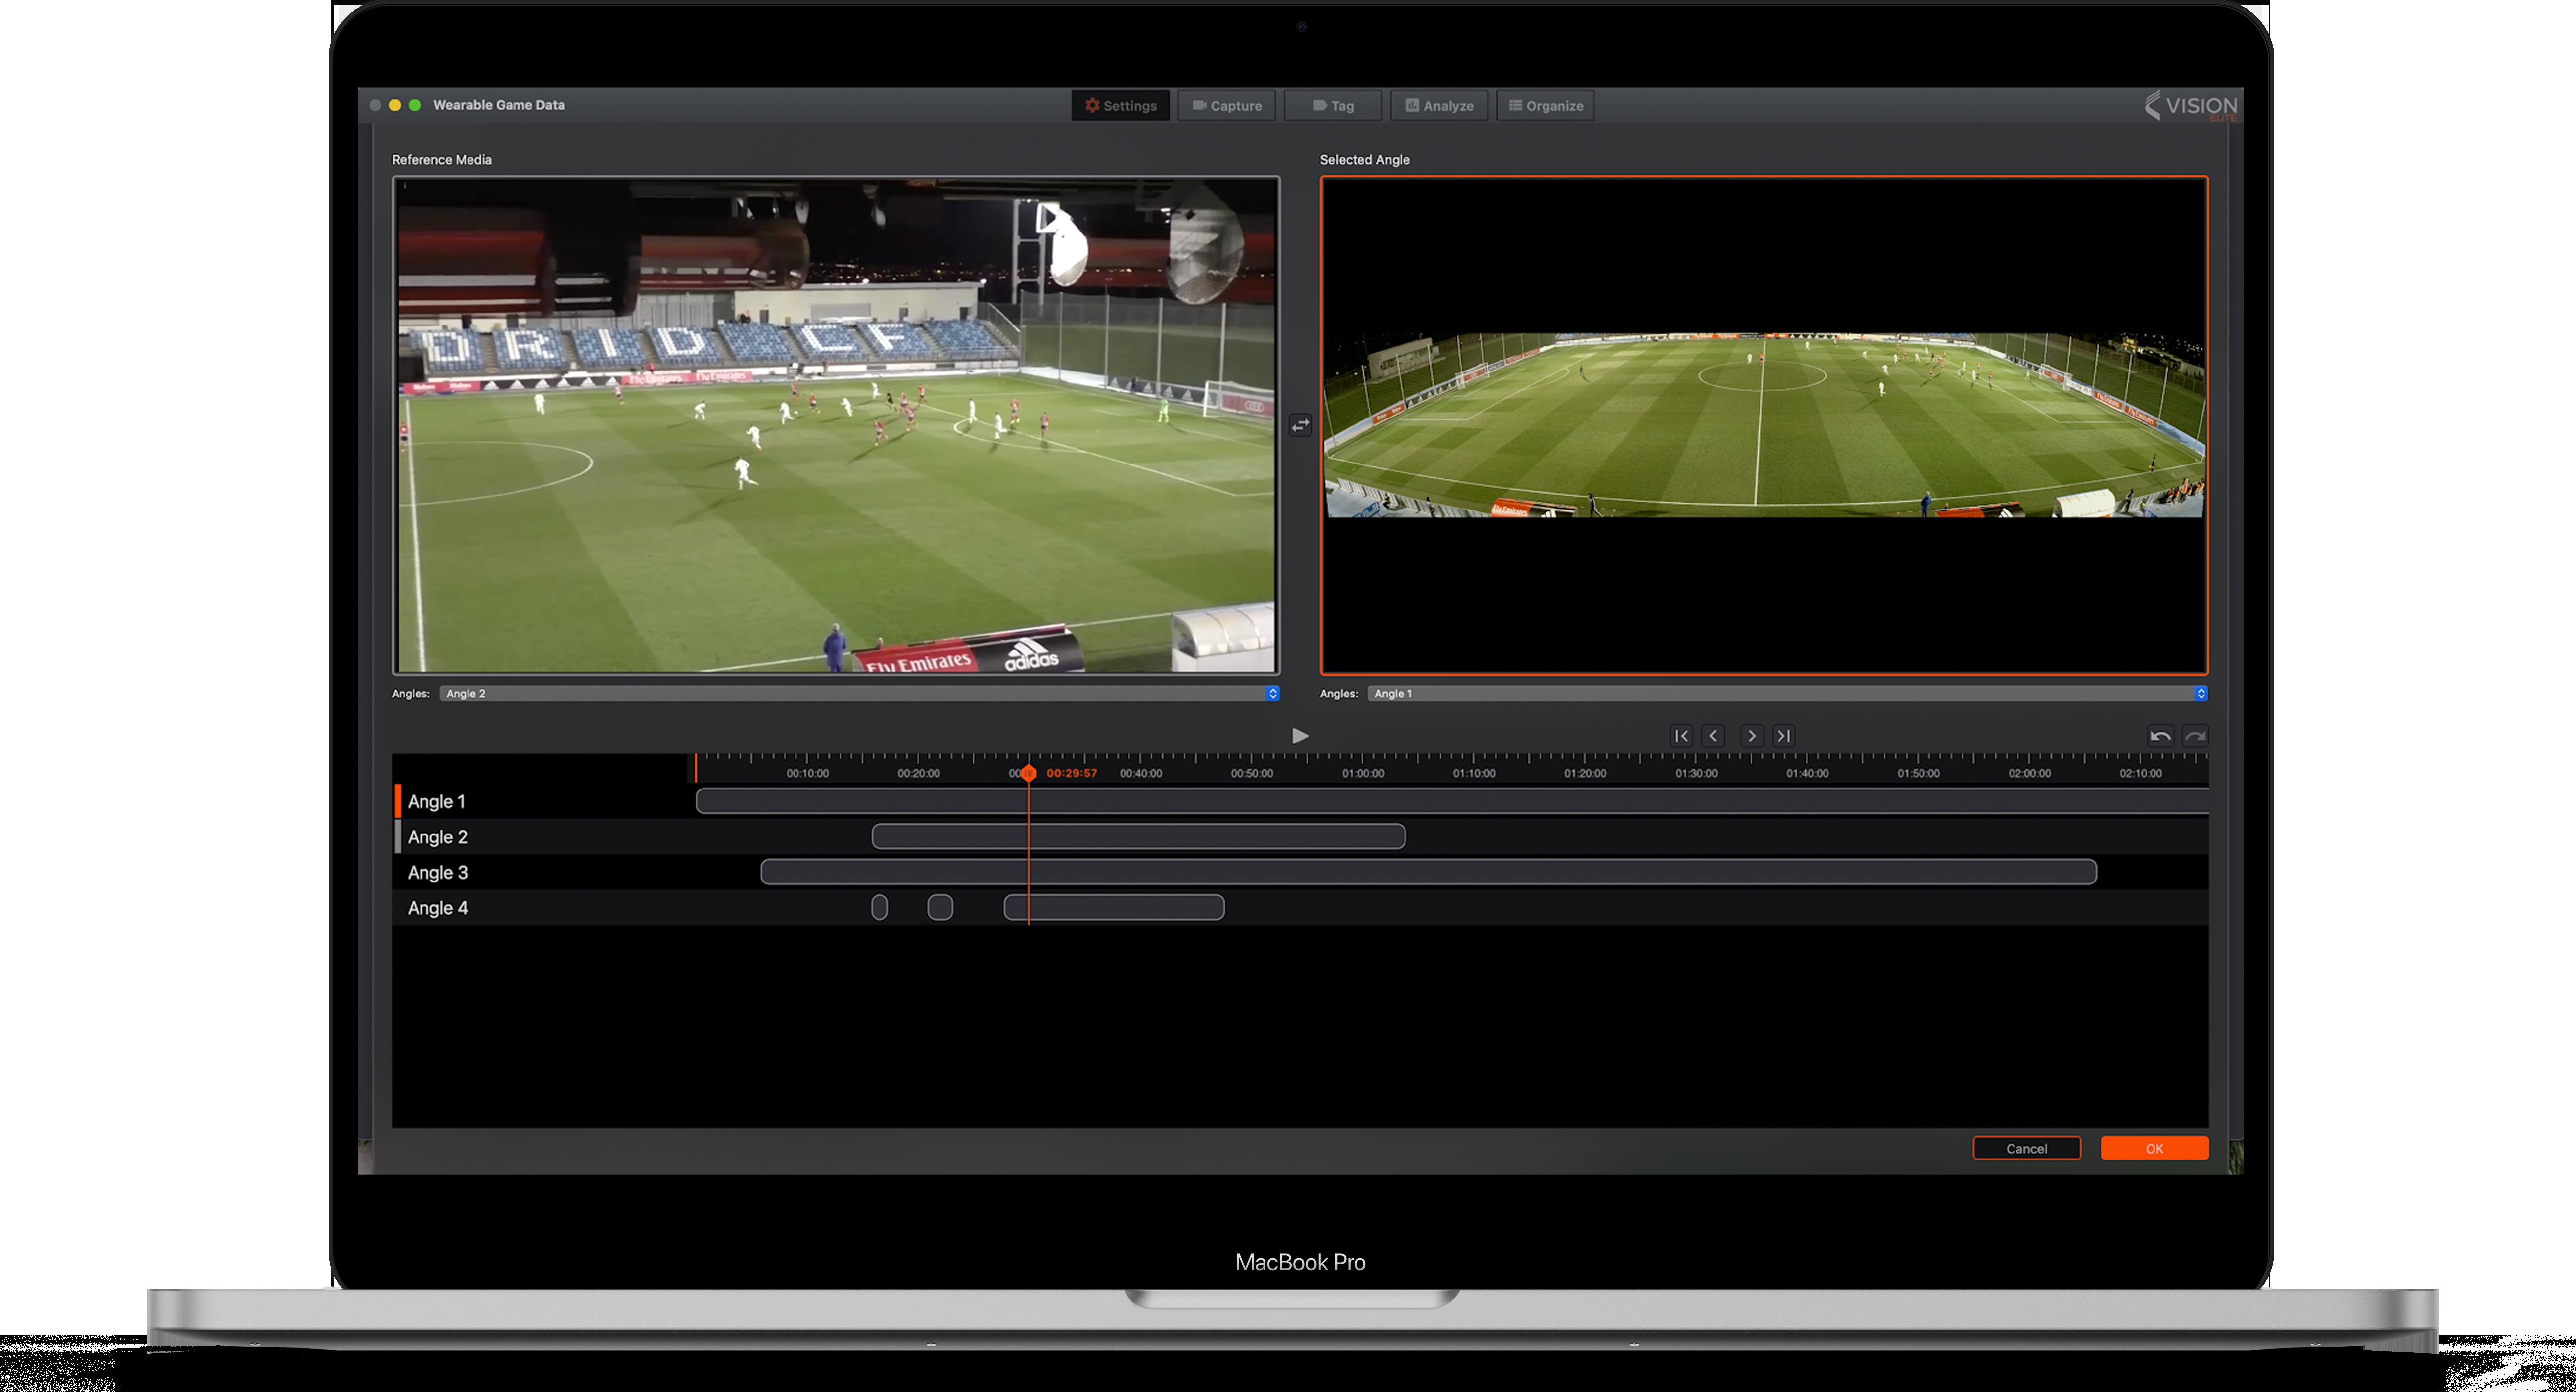 Vision: Multi-Angle Live Capture - Soccer